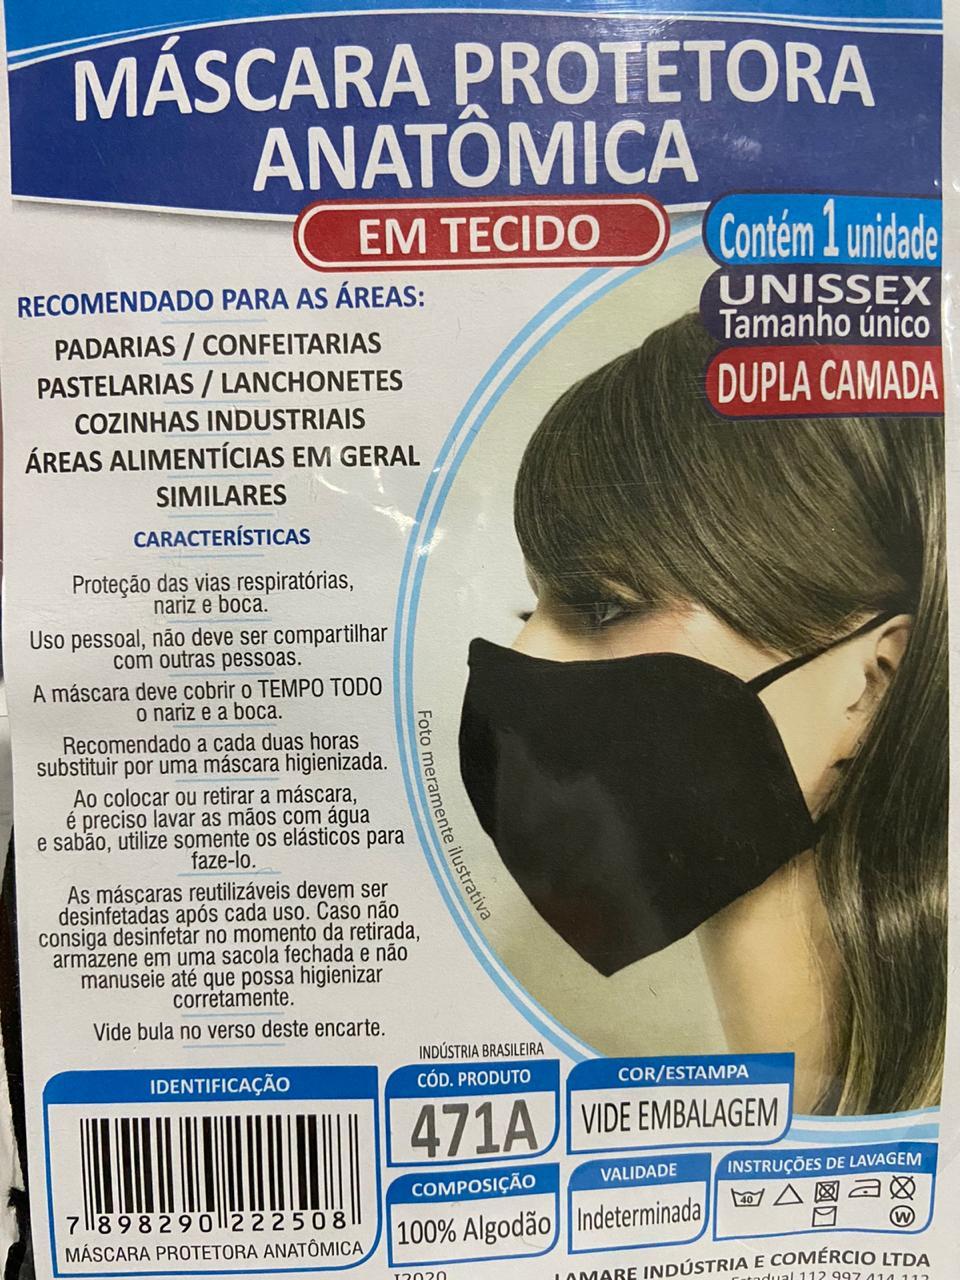 LAMARE - MASCARA TECIDO ANATOMICA UND